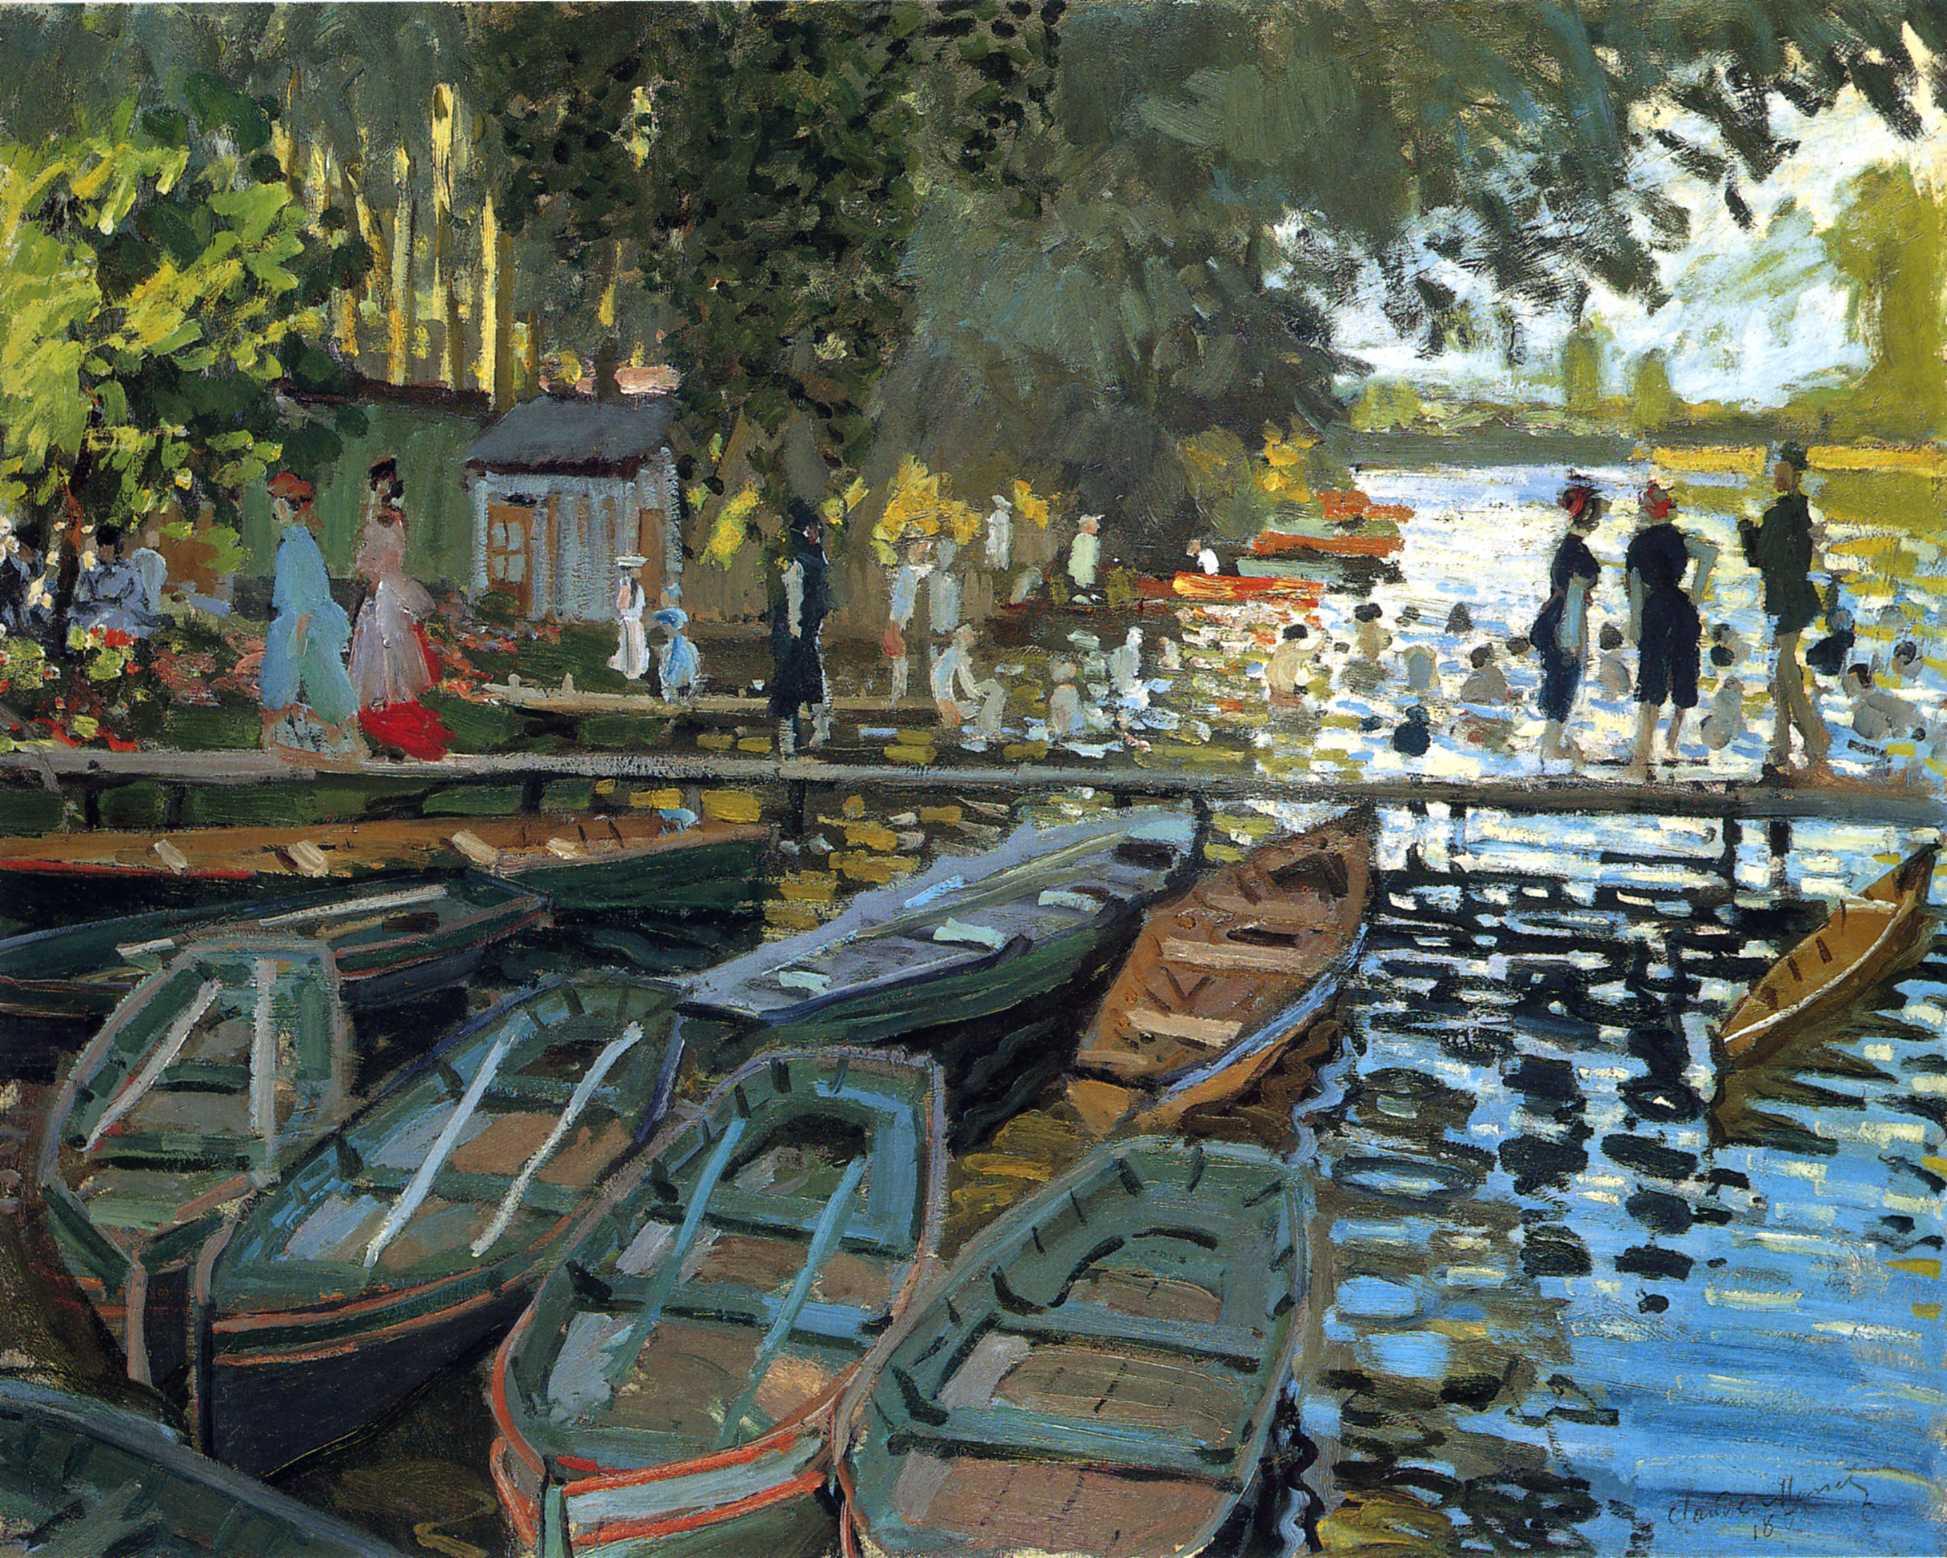 http://www.nationalgallery.org.uk/paintings/claude-monet-bathers-at-la-grenouillere